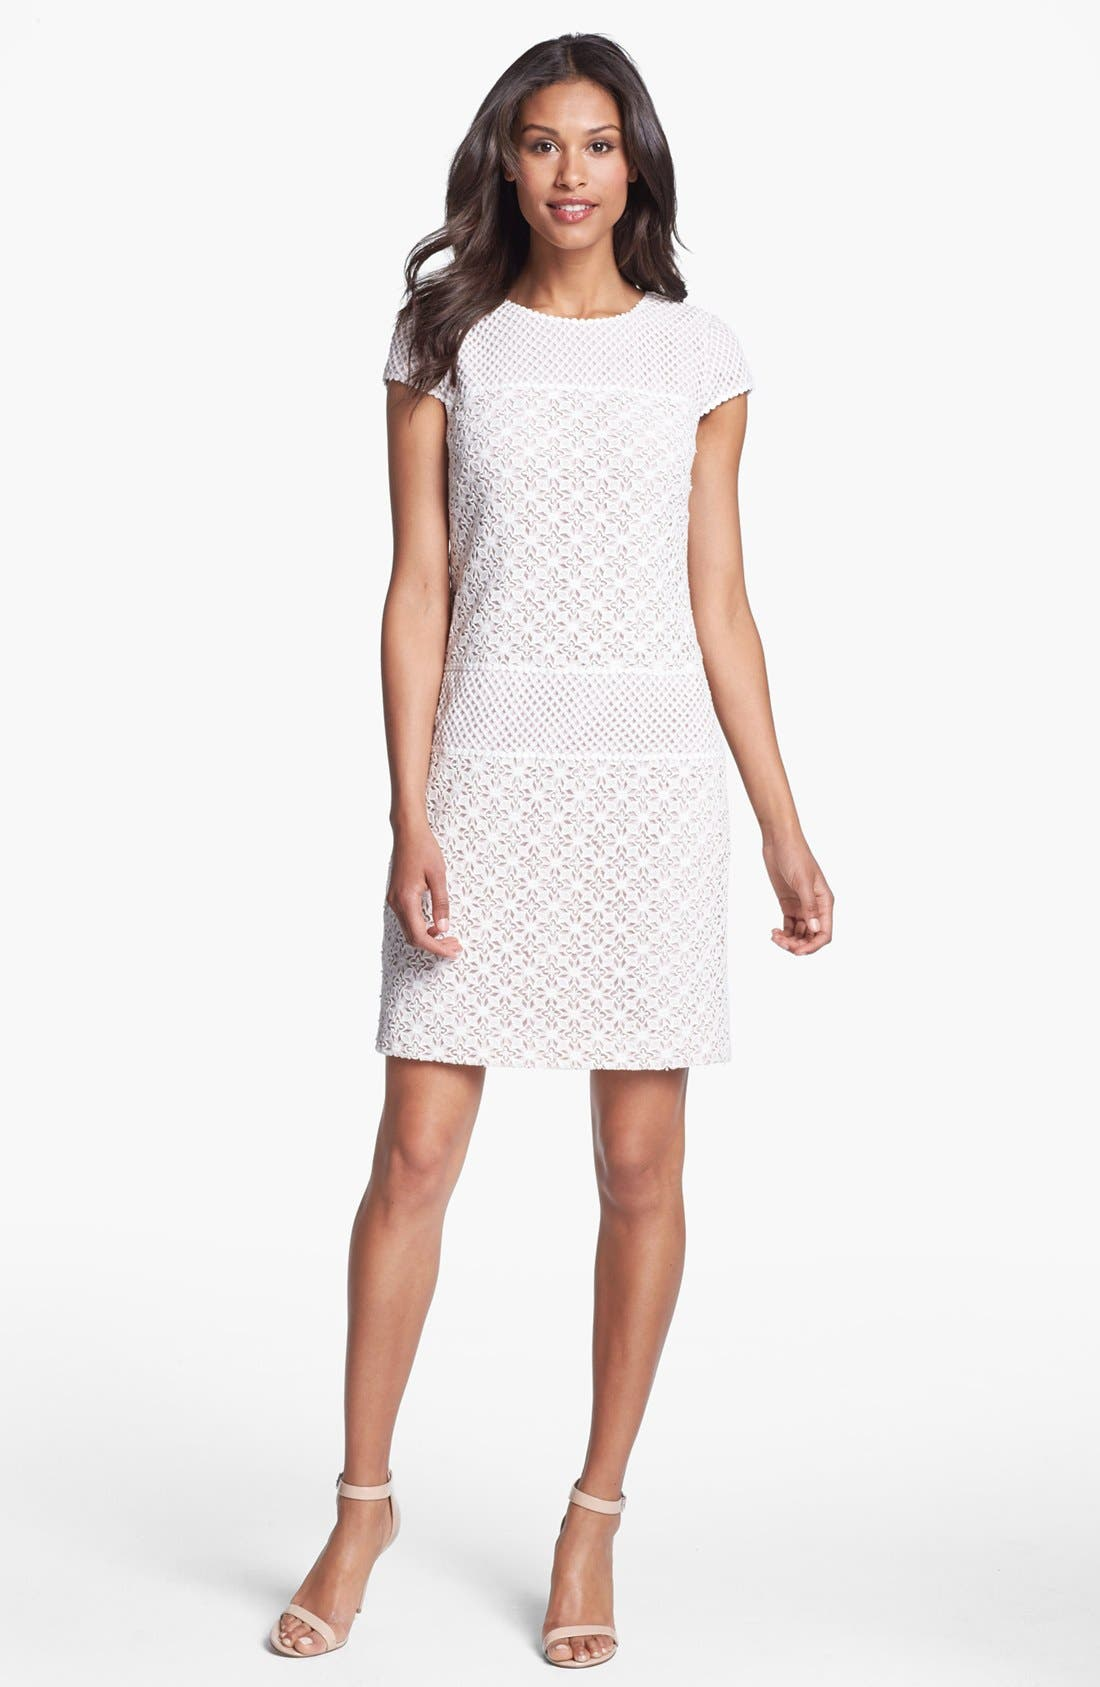 Alternate Image 1 Selected - Ivy & Blu Mixed Lace Dress (Petite)